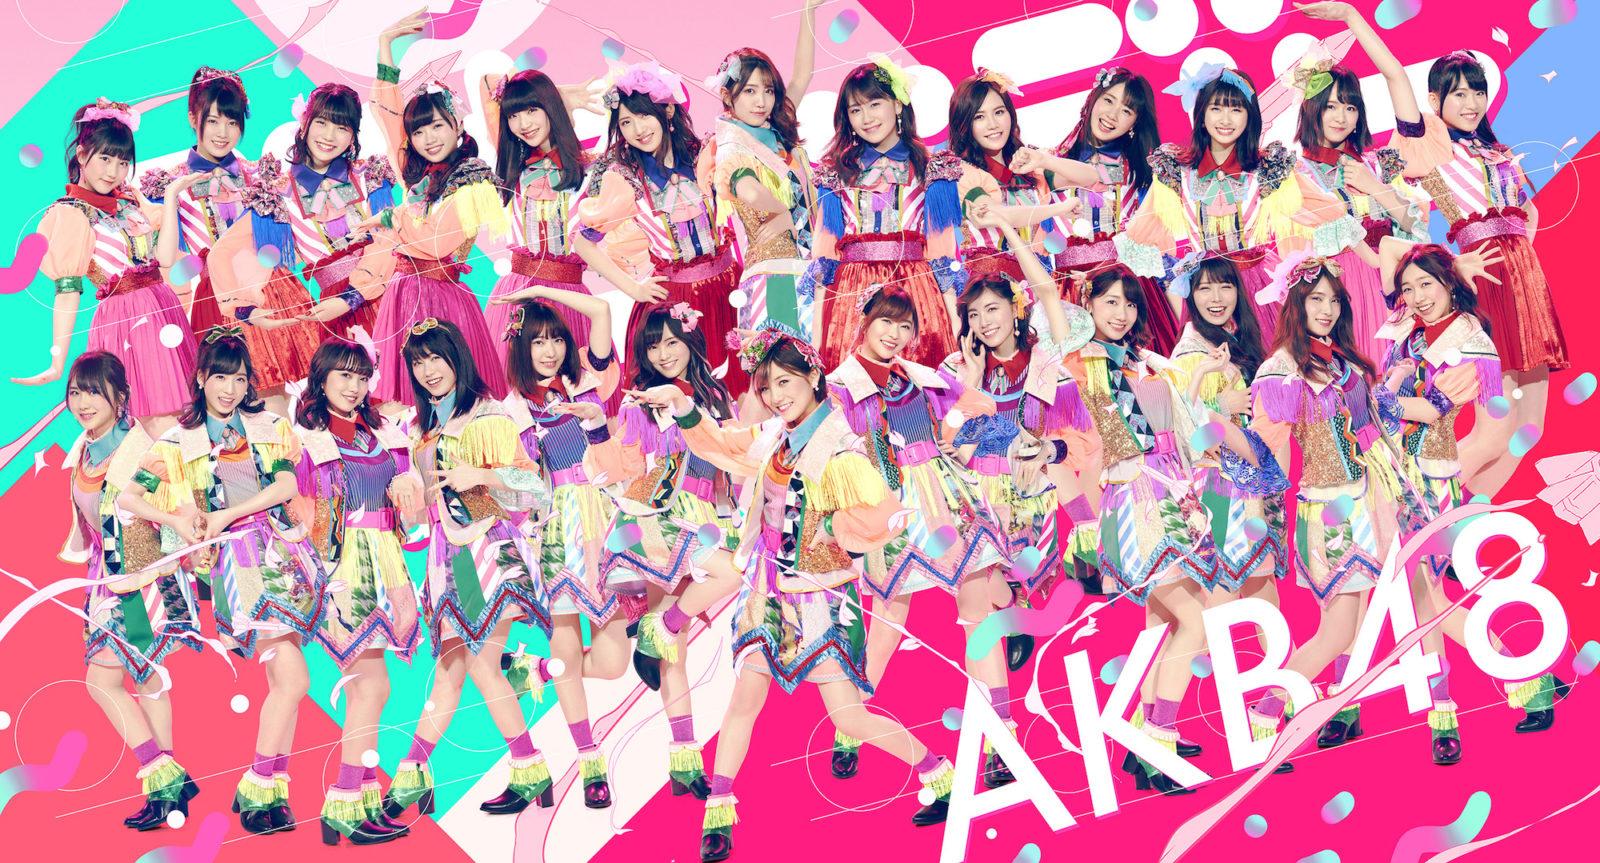 AKB48横山由依、ユニット7周年で大島優子・指原莉乃・北原里英らに連絡したことを明かし「様々な反応が」サムネイル画像